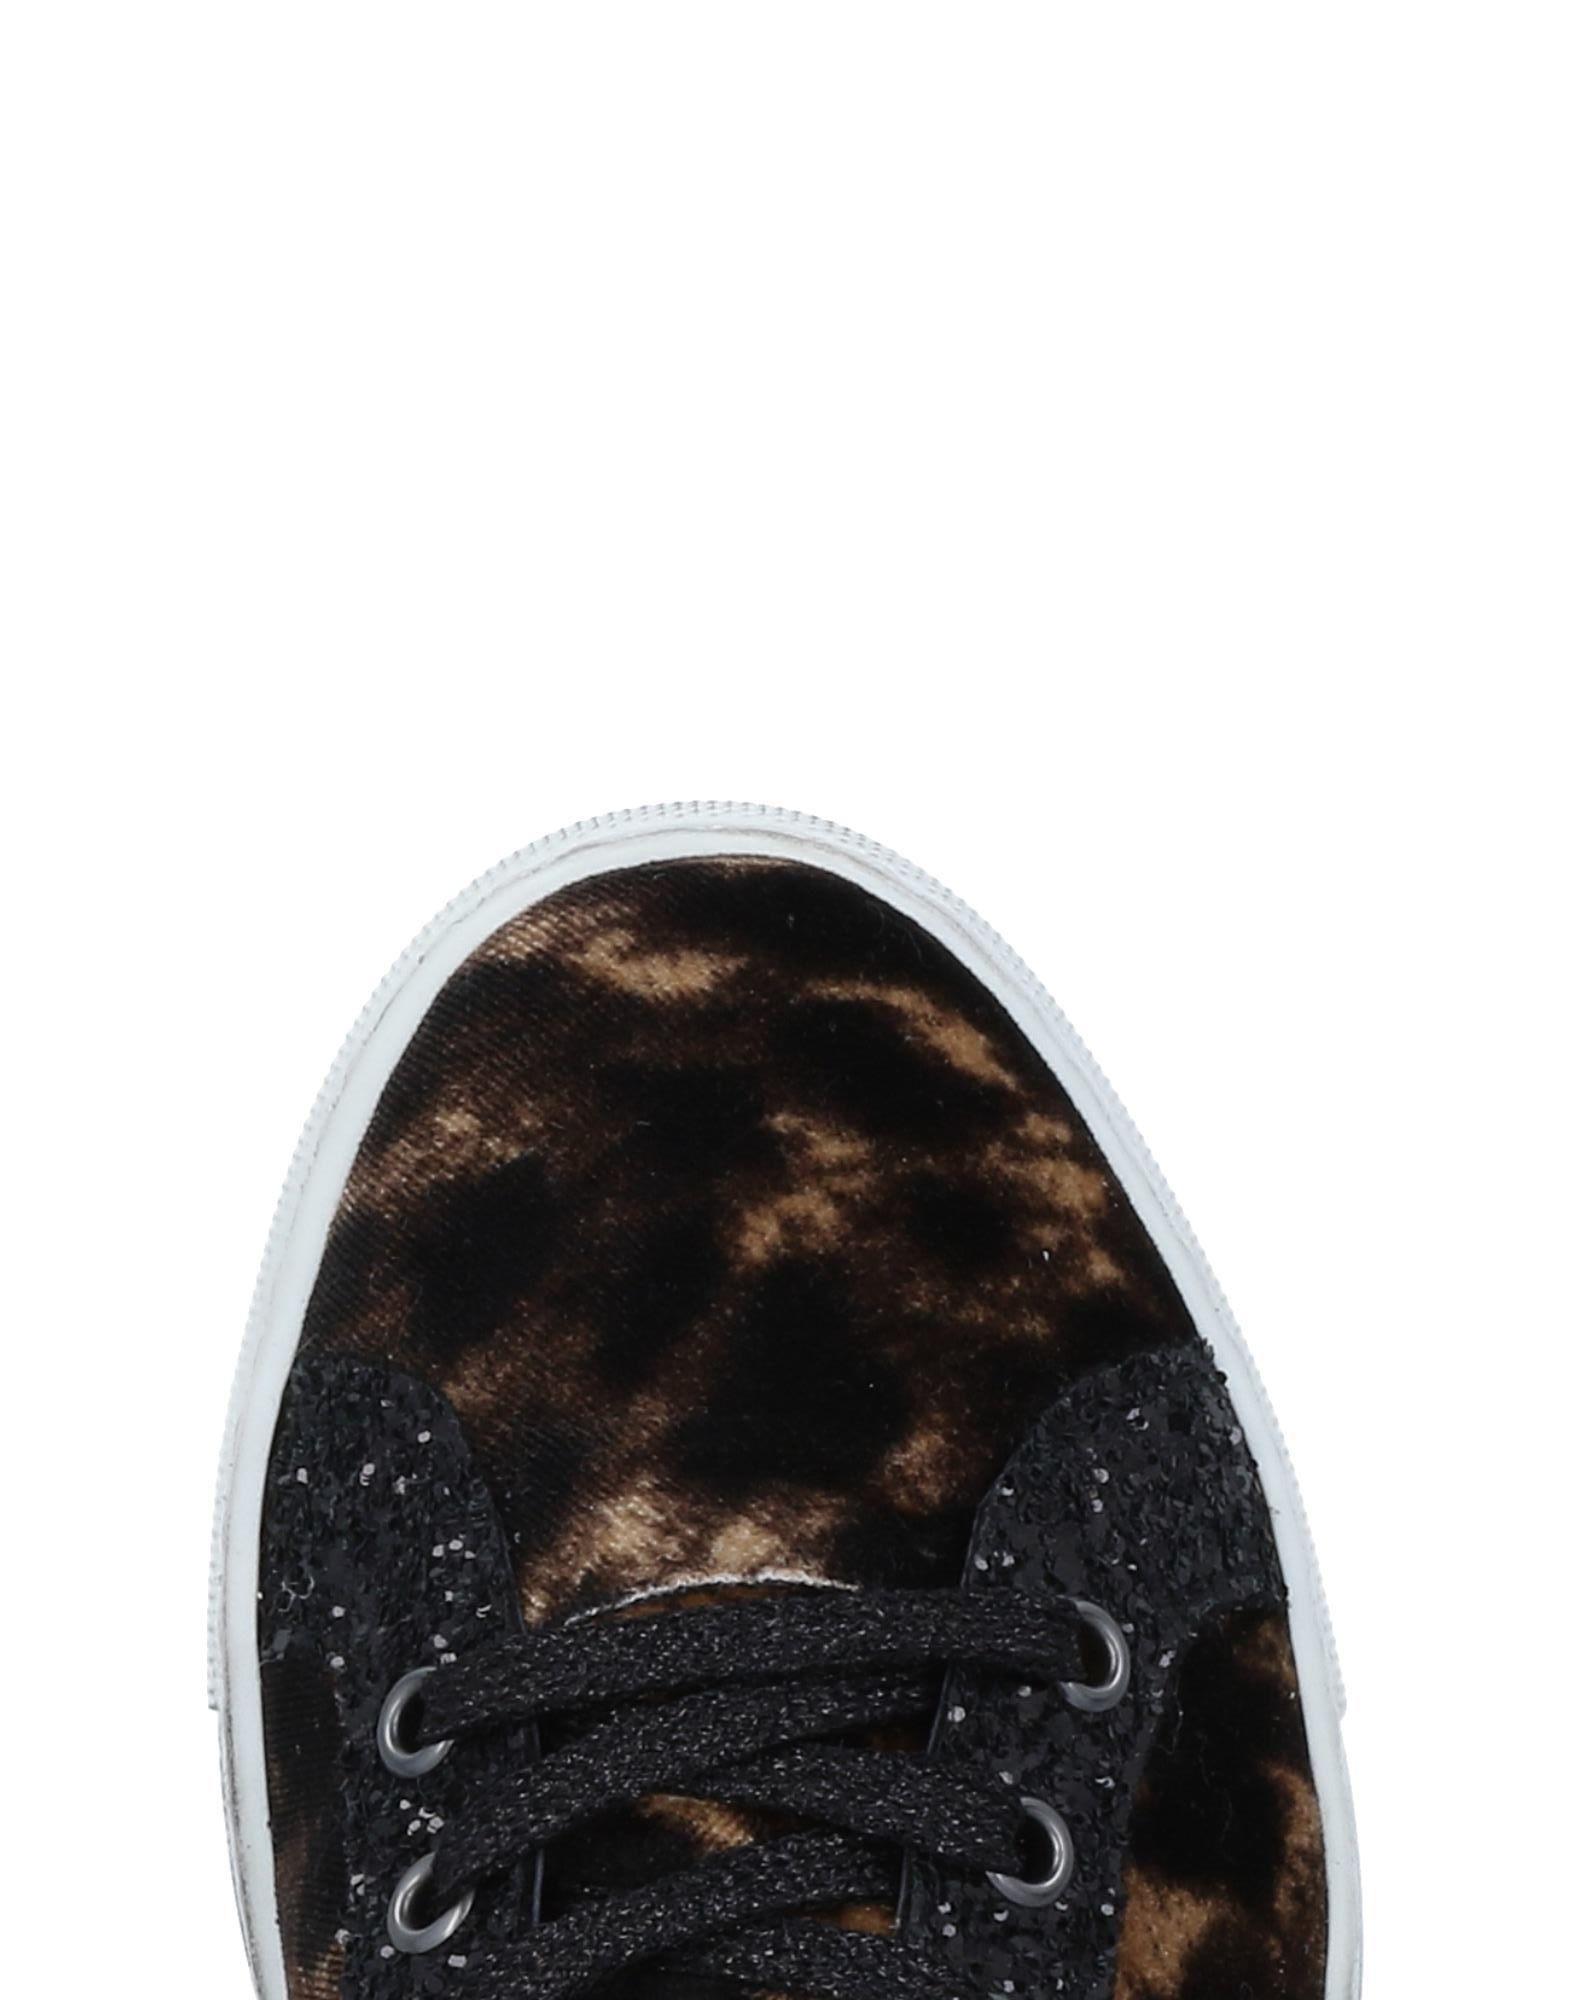 Moda Sneakers Geneve Geneve Geneve Donna - 11485815PM 6a0d21